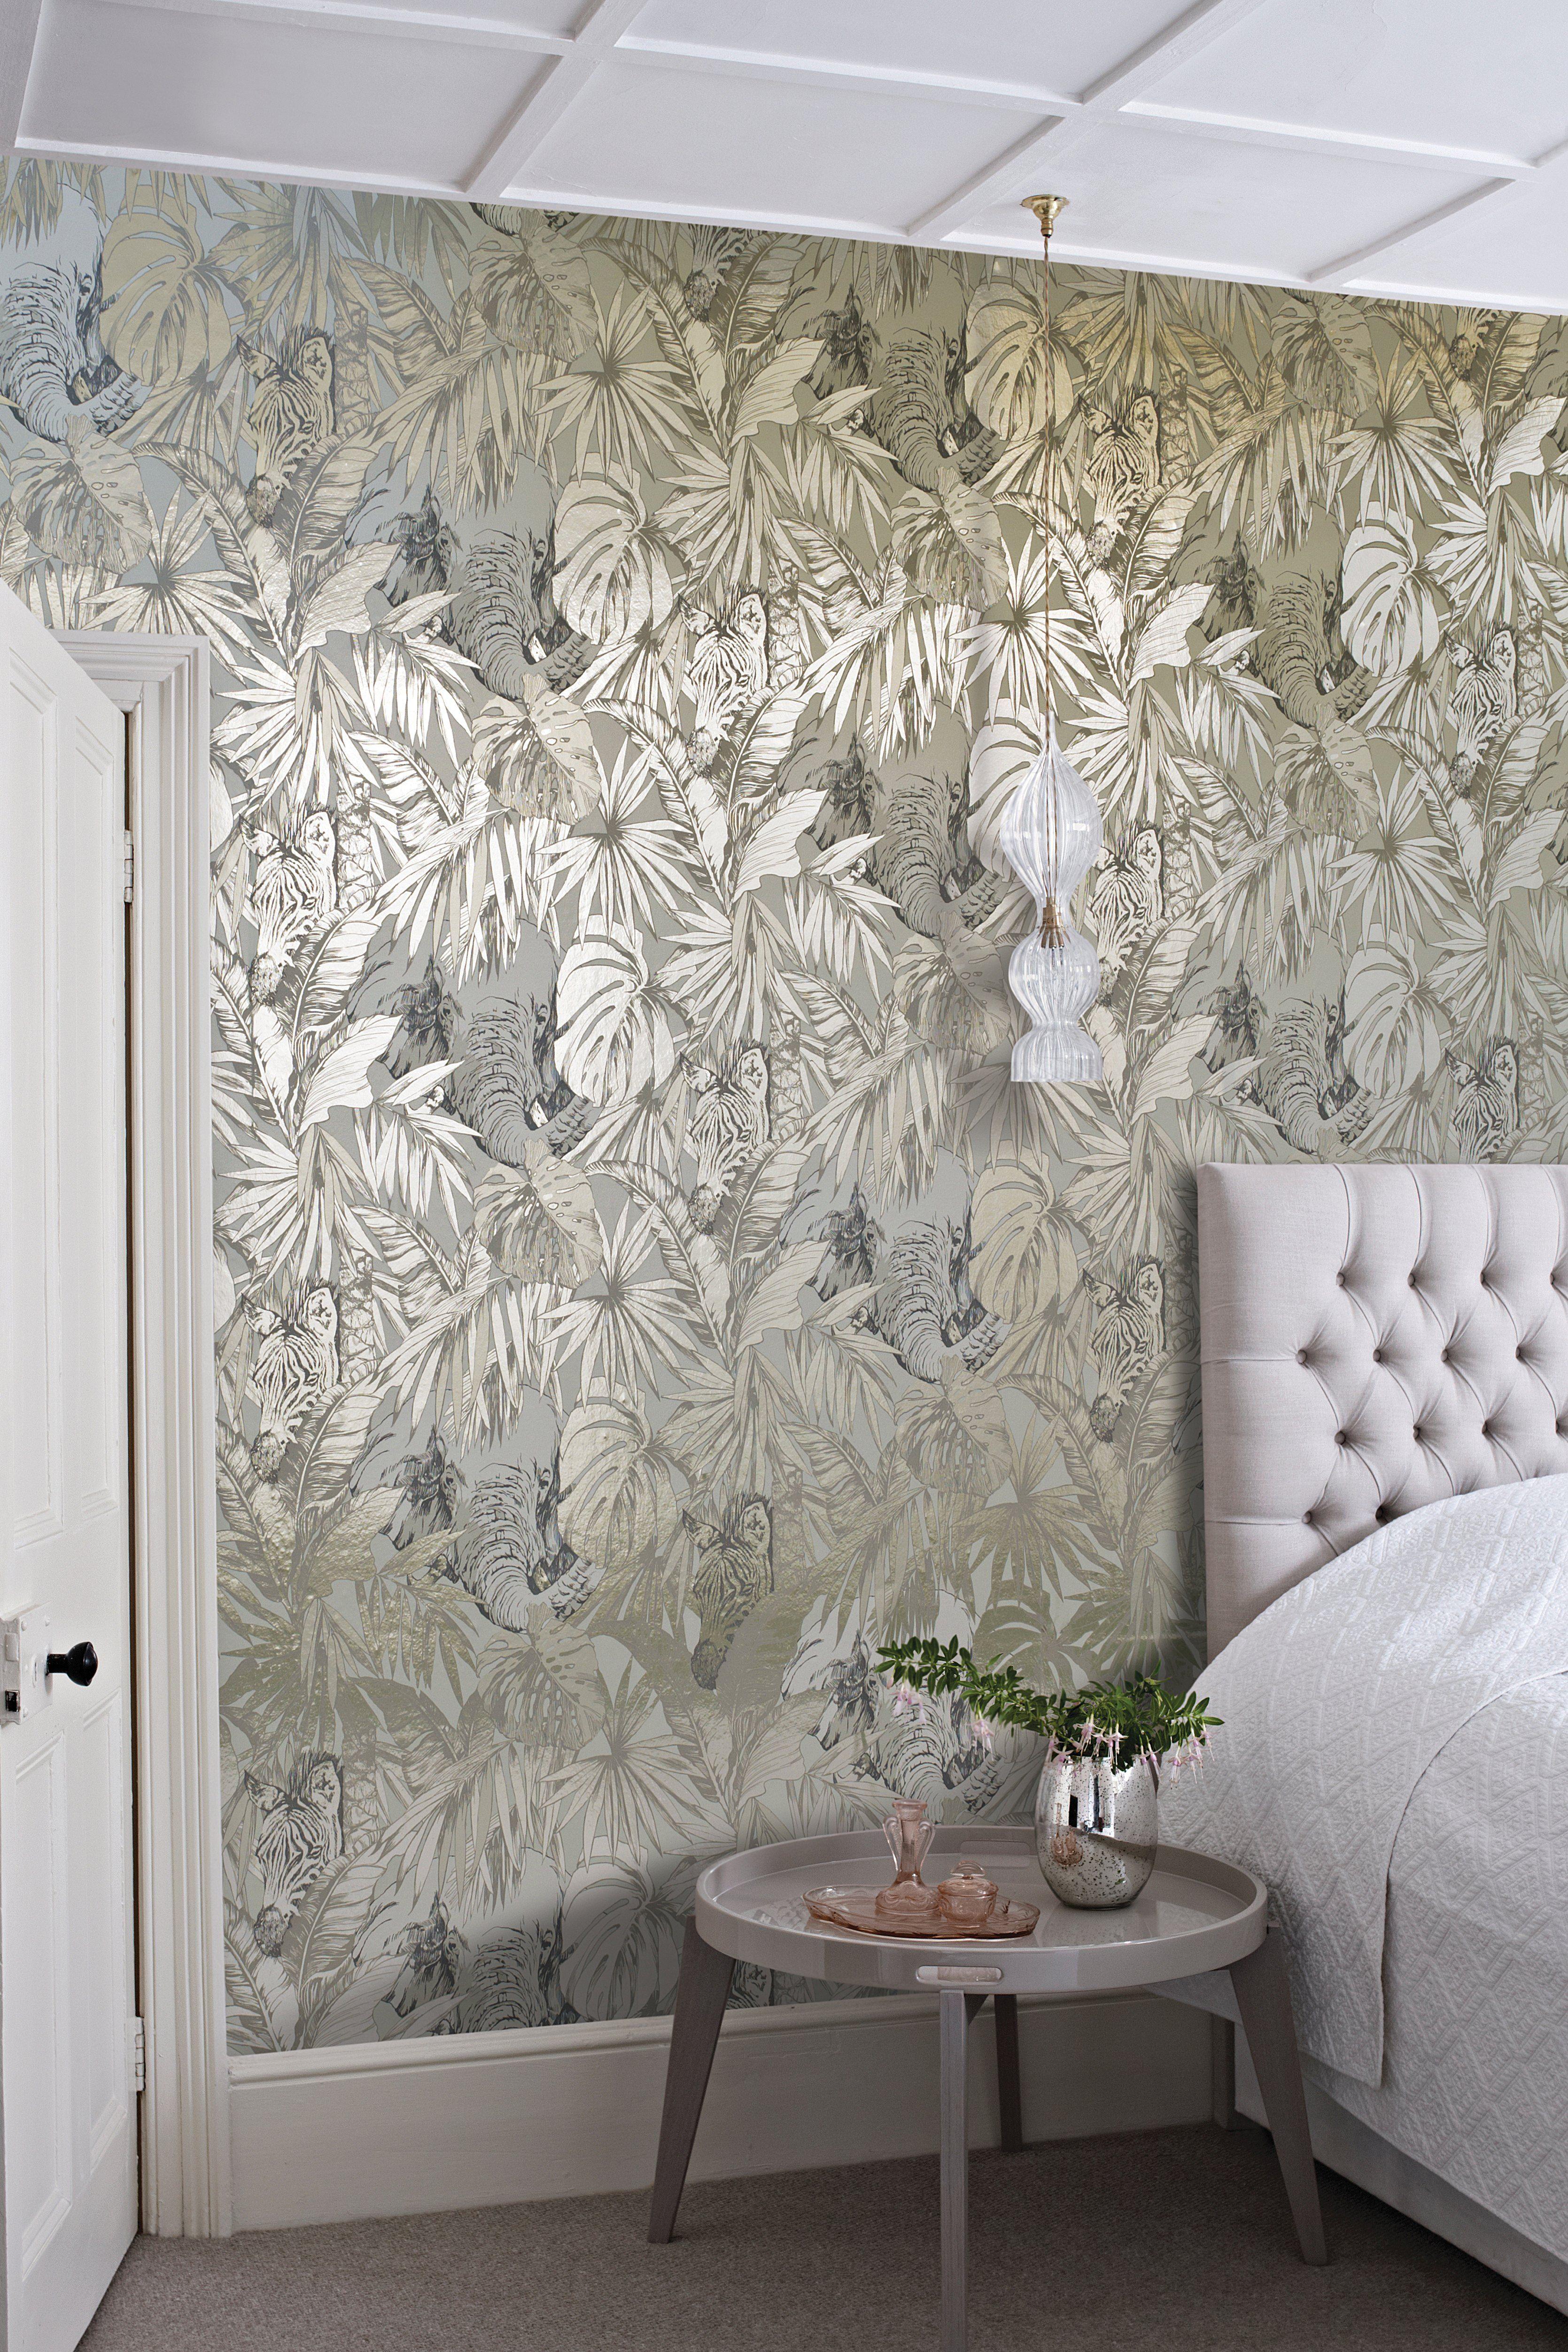 Fantasy Jungle Scenes Origin Collection Metallic Wallpaper Bathroom Wallpaper Trends Wallpaper Trends